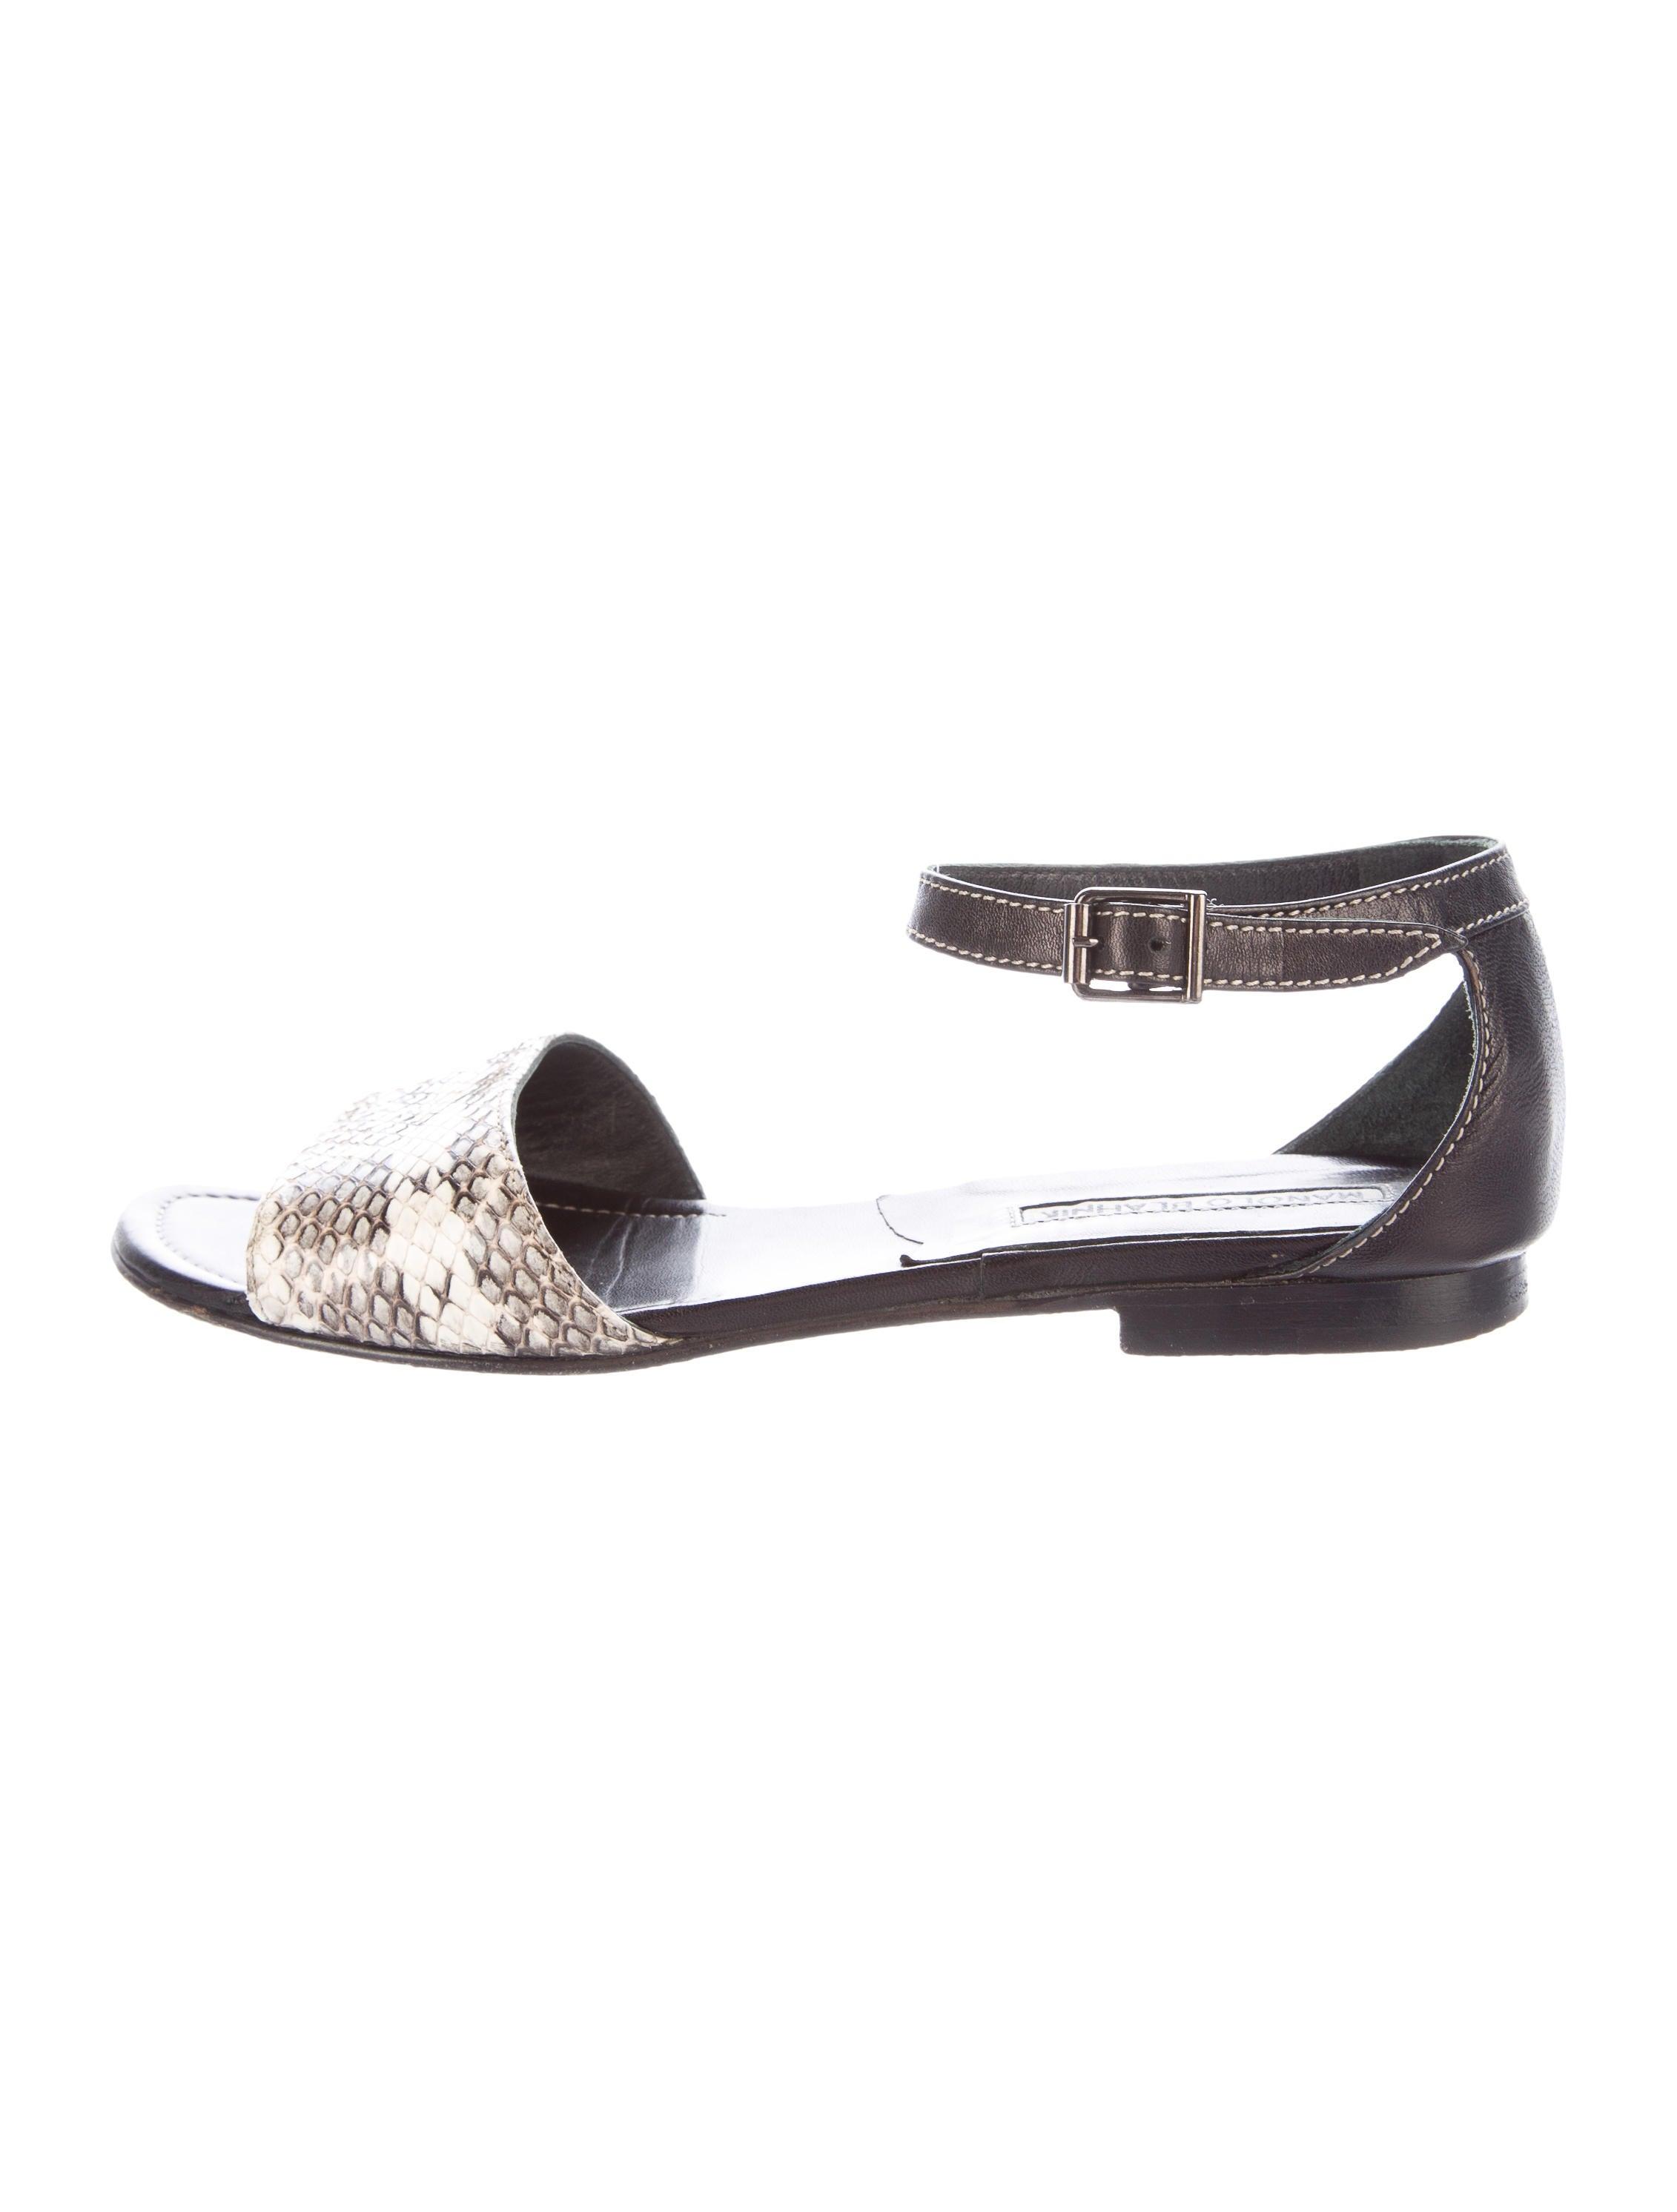 Manolo blahnik snakeskin flat sandals shoes moo60959 for Shoes by manolo blahnik